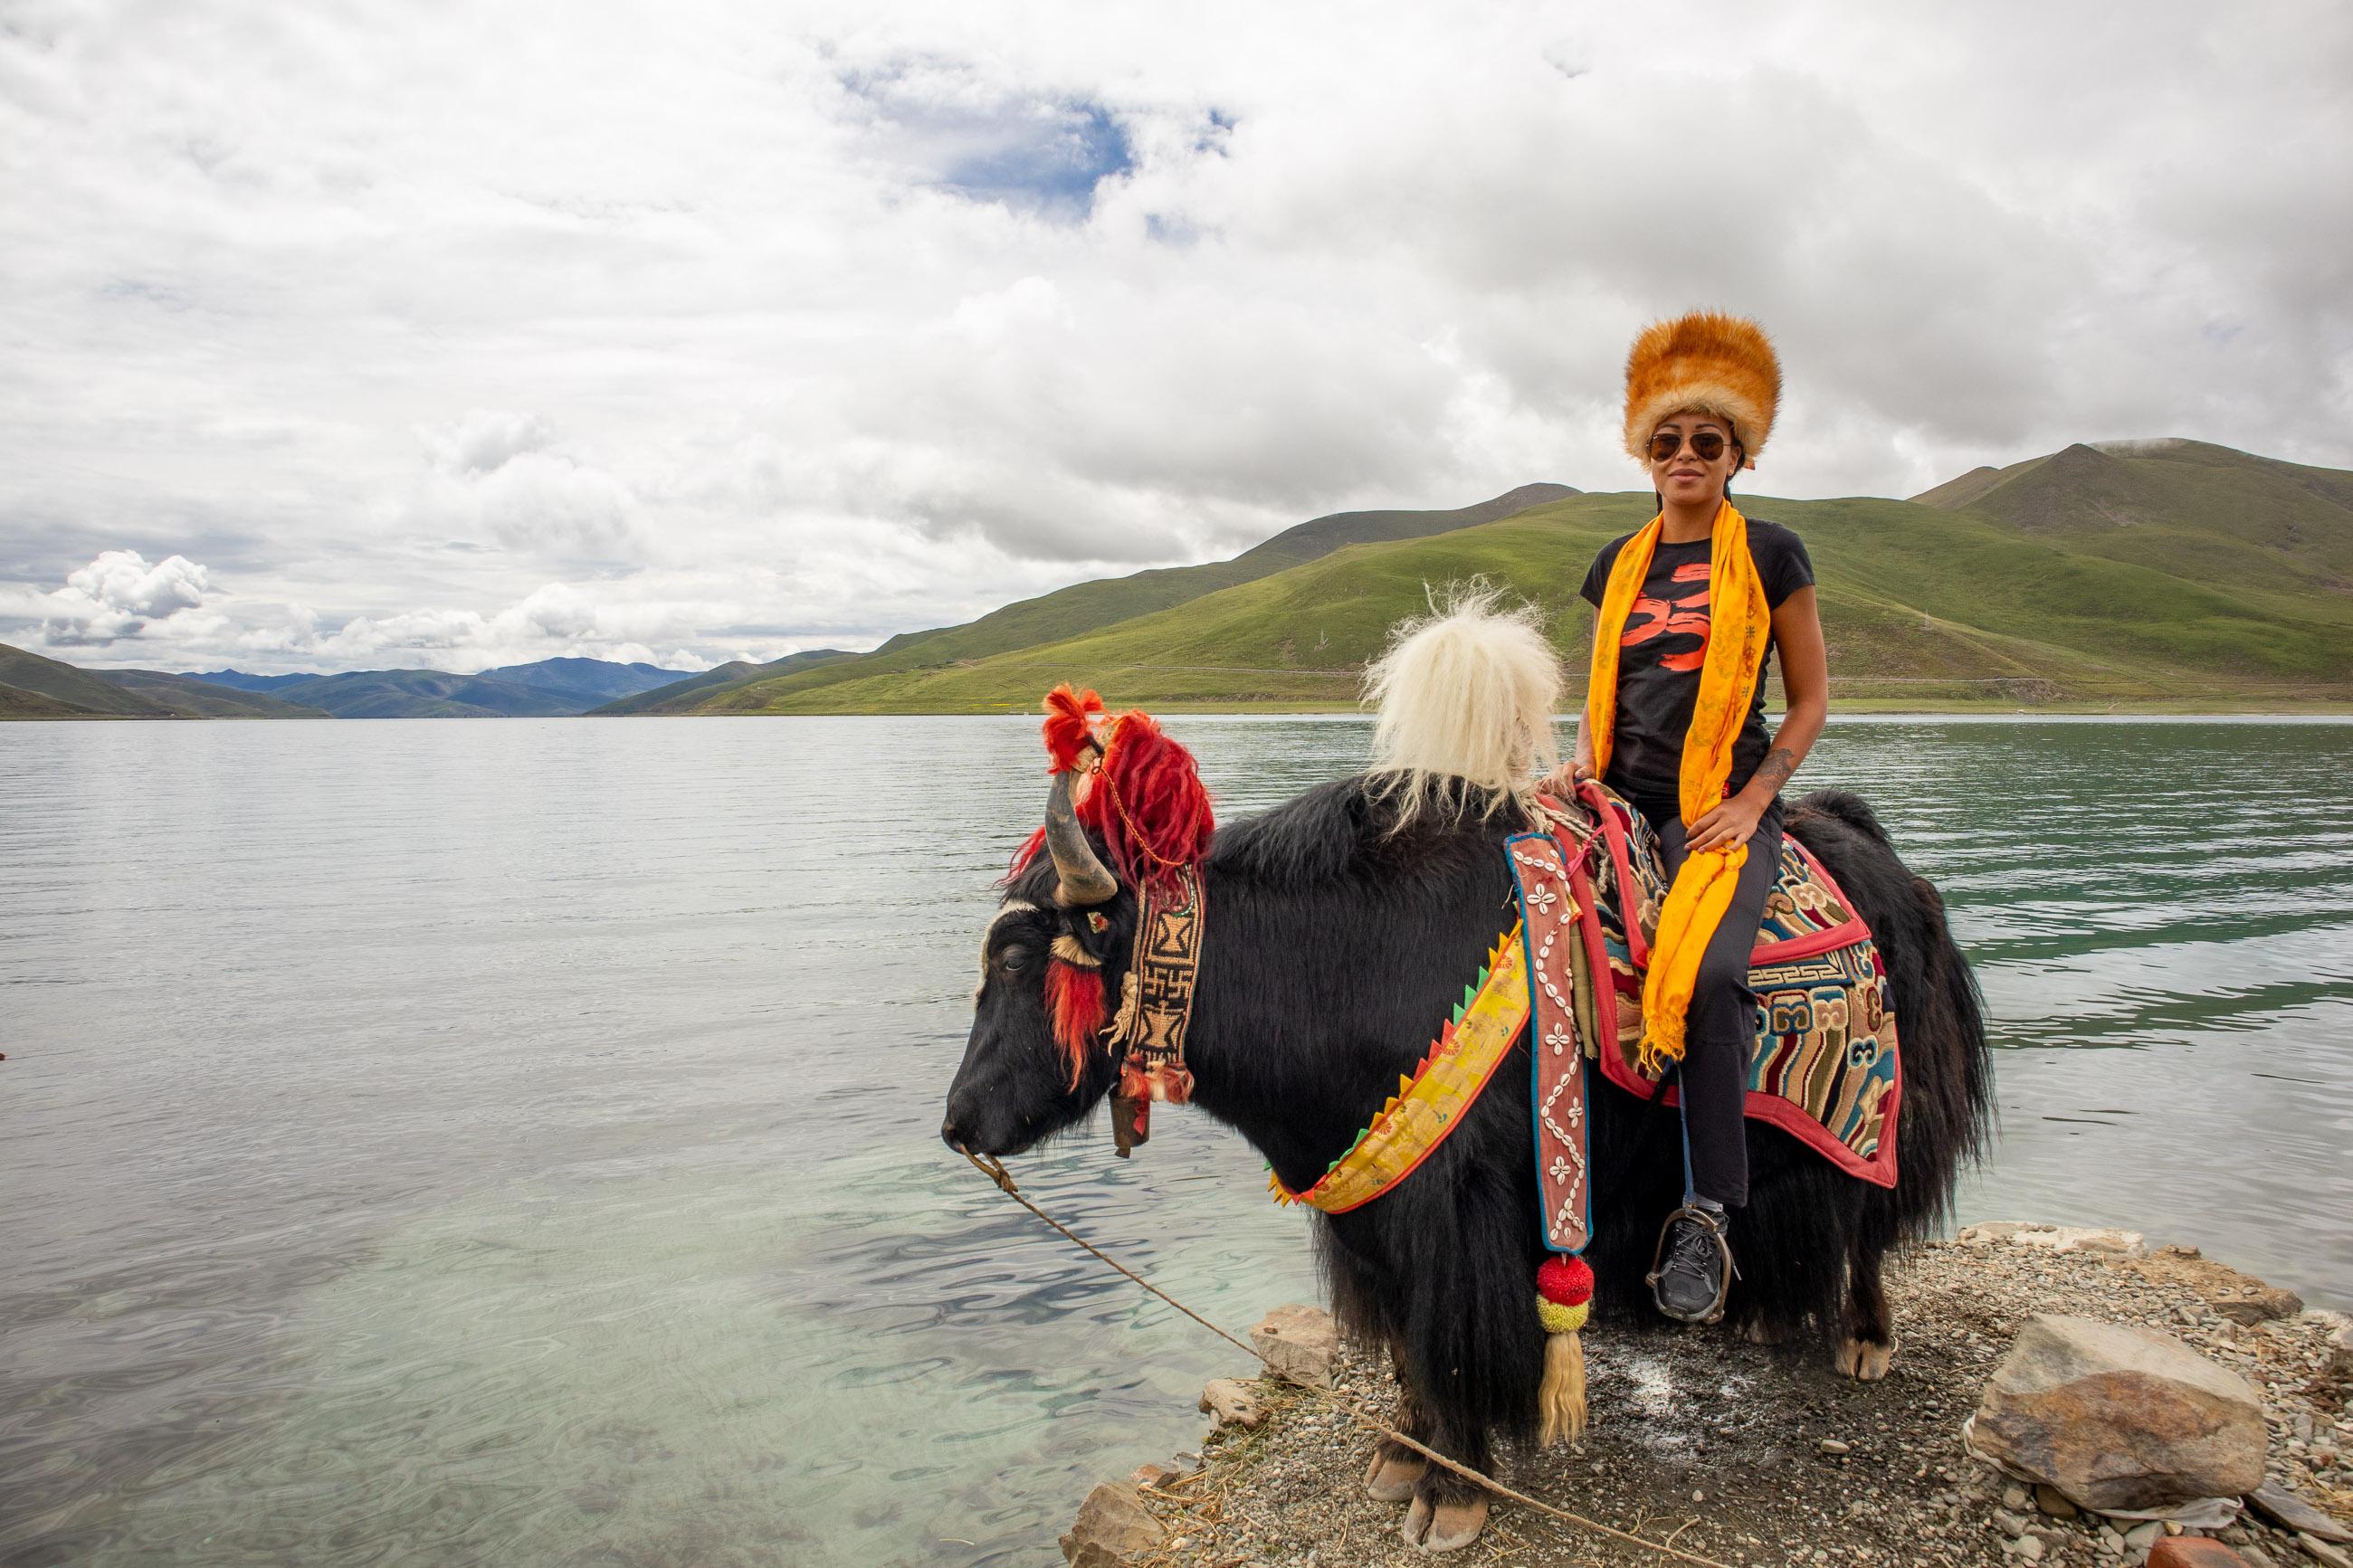 https://bubo.sk/uploads/galleries/16317/nikol_deckous_img_tibet_0747-27.jpg